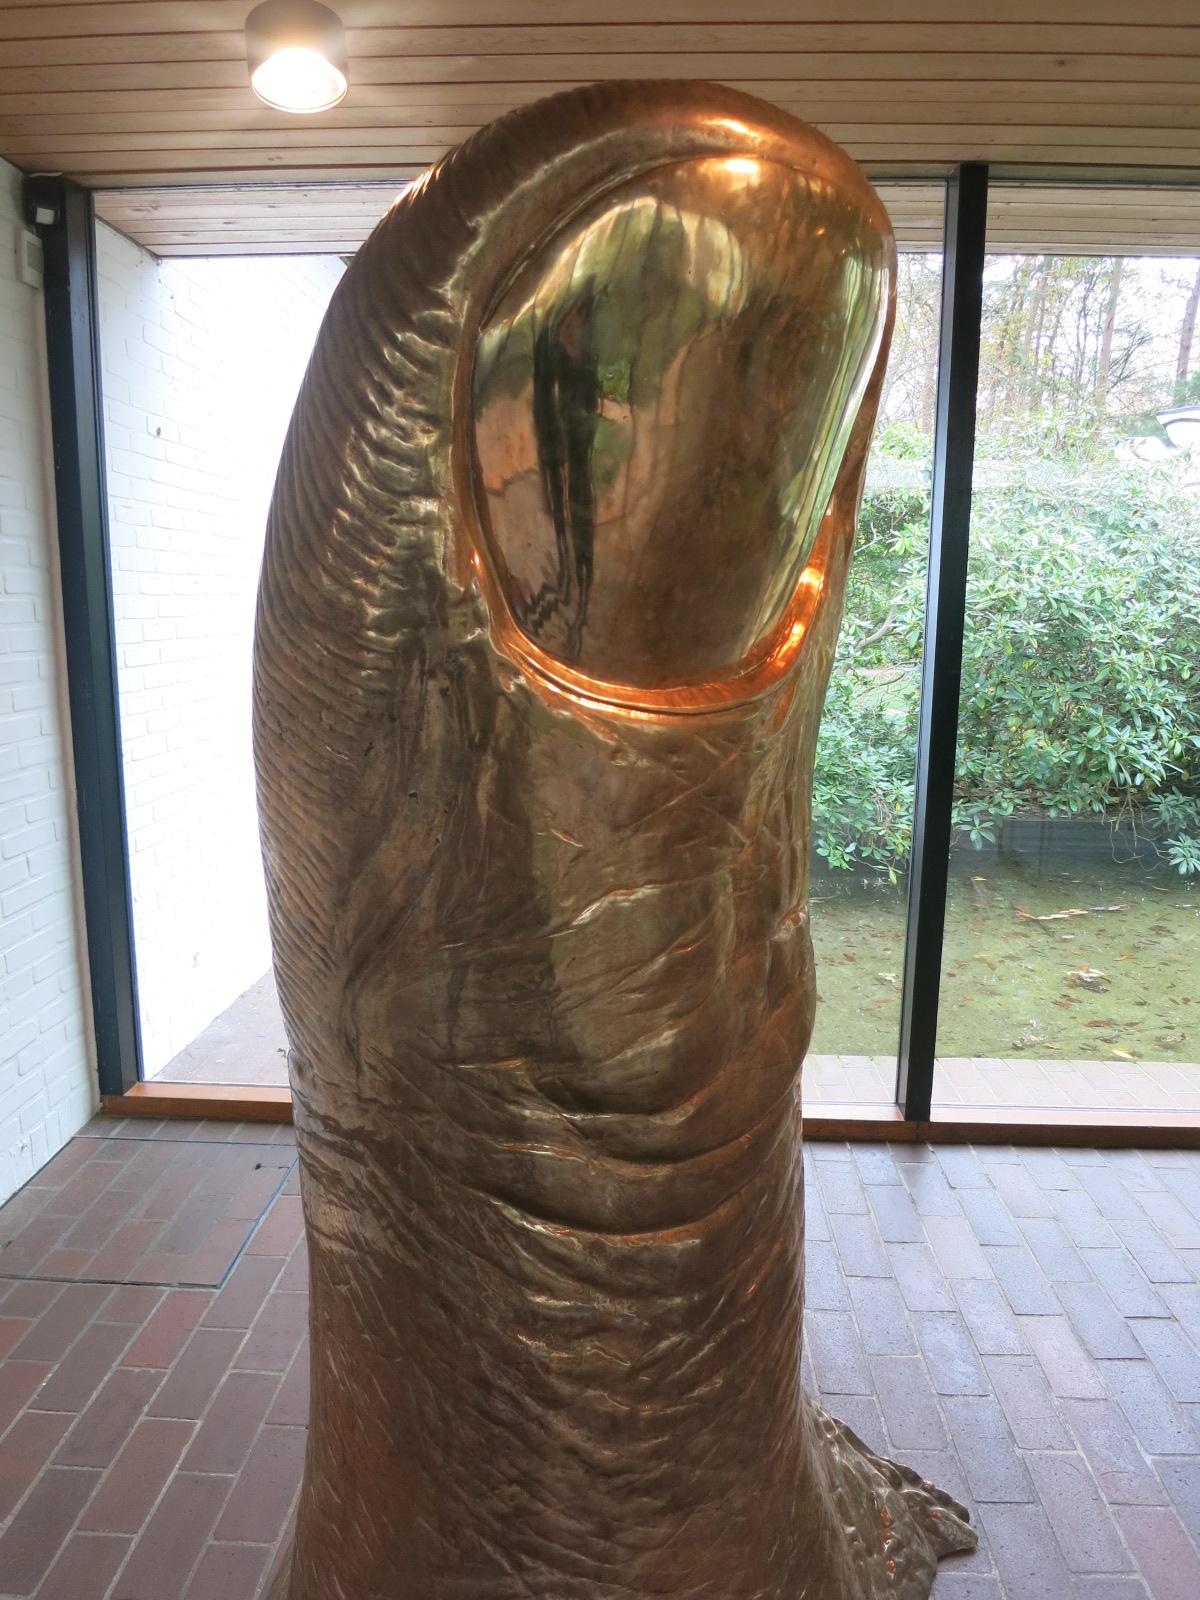 Louisiana Museum of Modern Art, Humlebaek, Denmark. Cesar's 'La Grande Puce' 1968